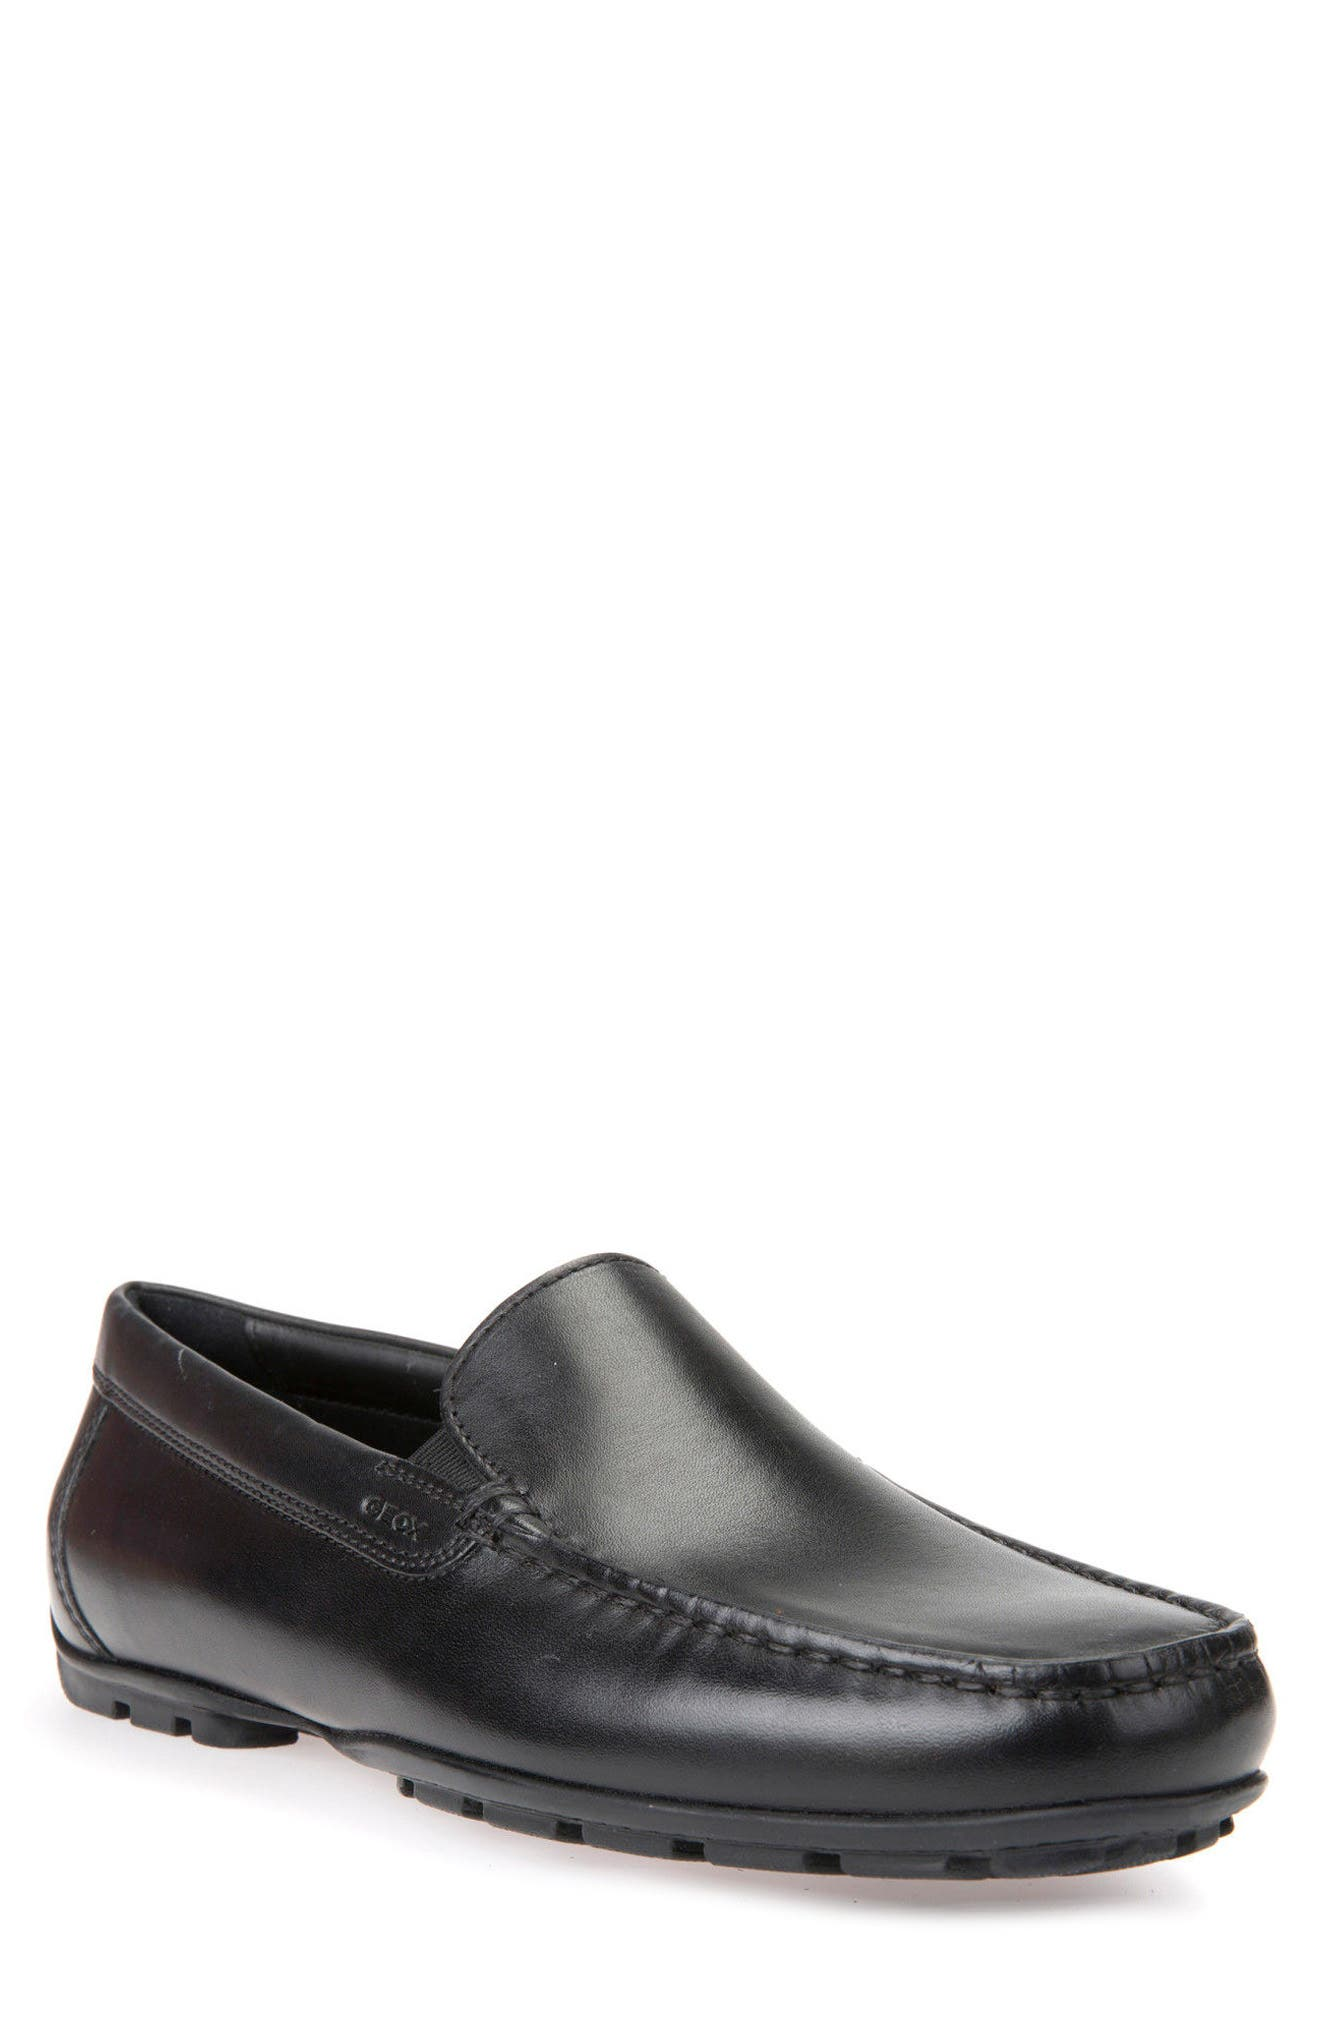 Moner 2Fit 2 Driving Moccasin,                         Main,                         color, Black Leather